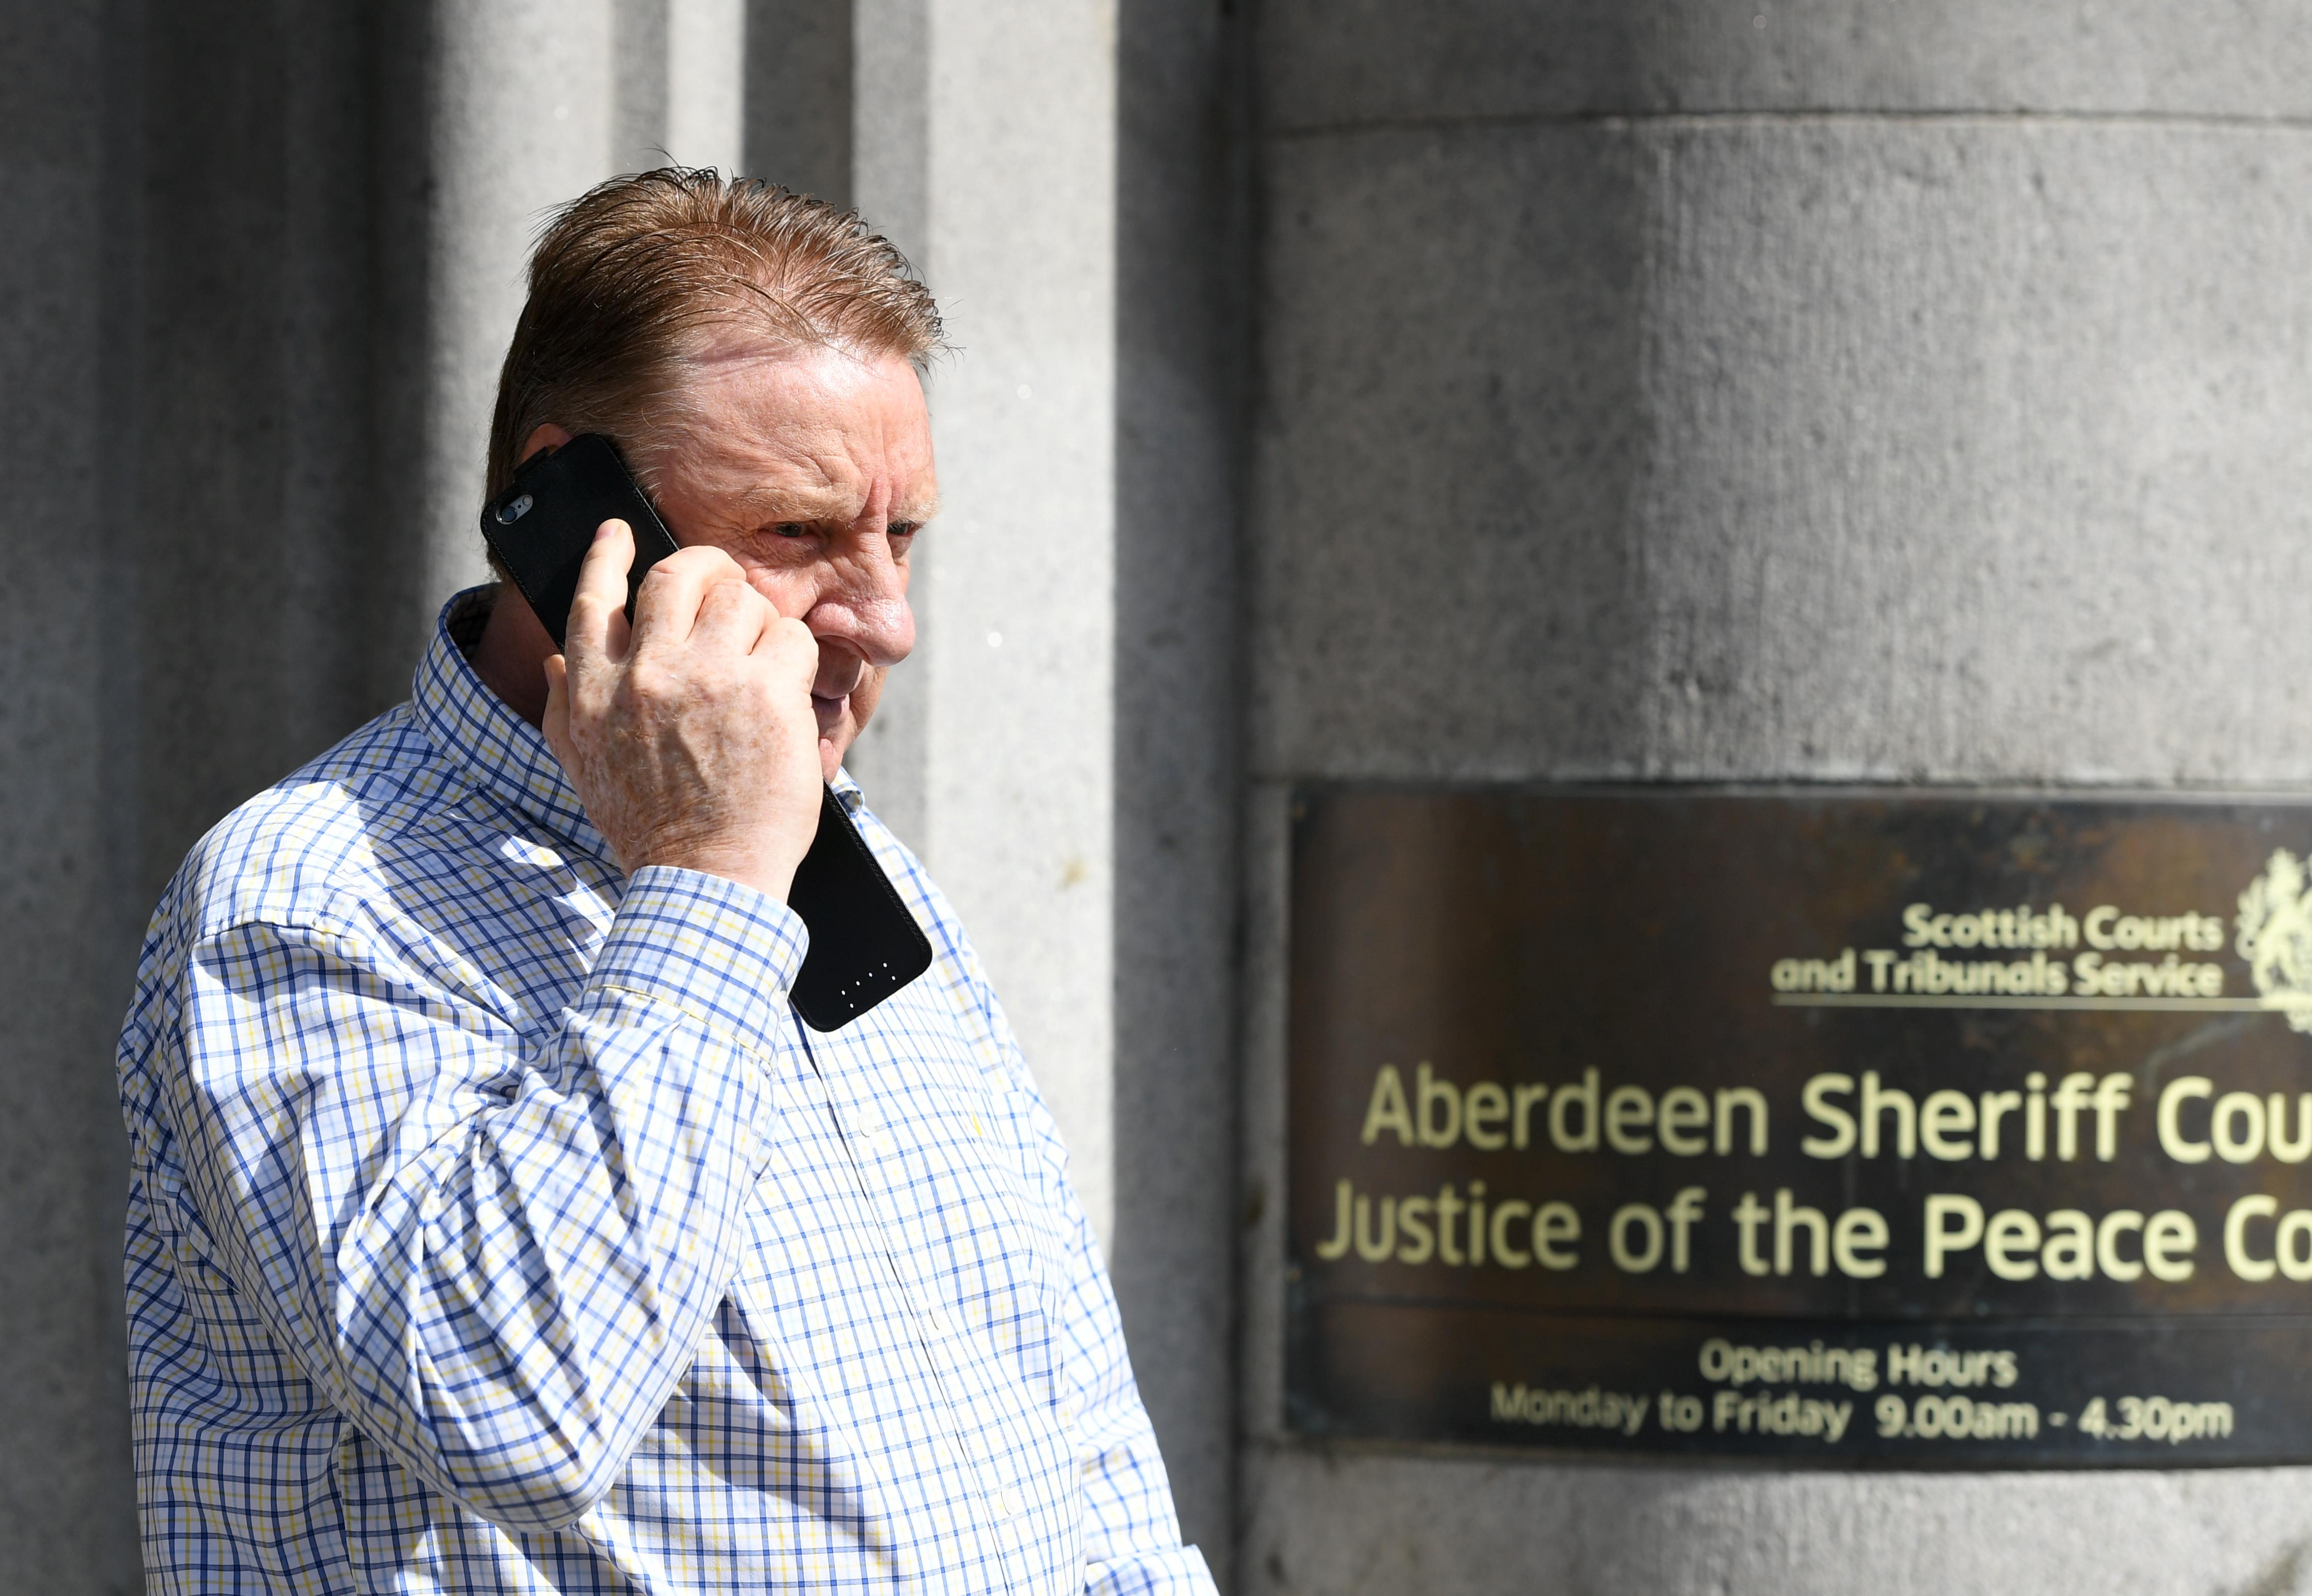 Alan Massey at Aberdeen Sheriff Court